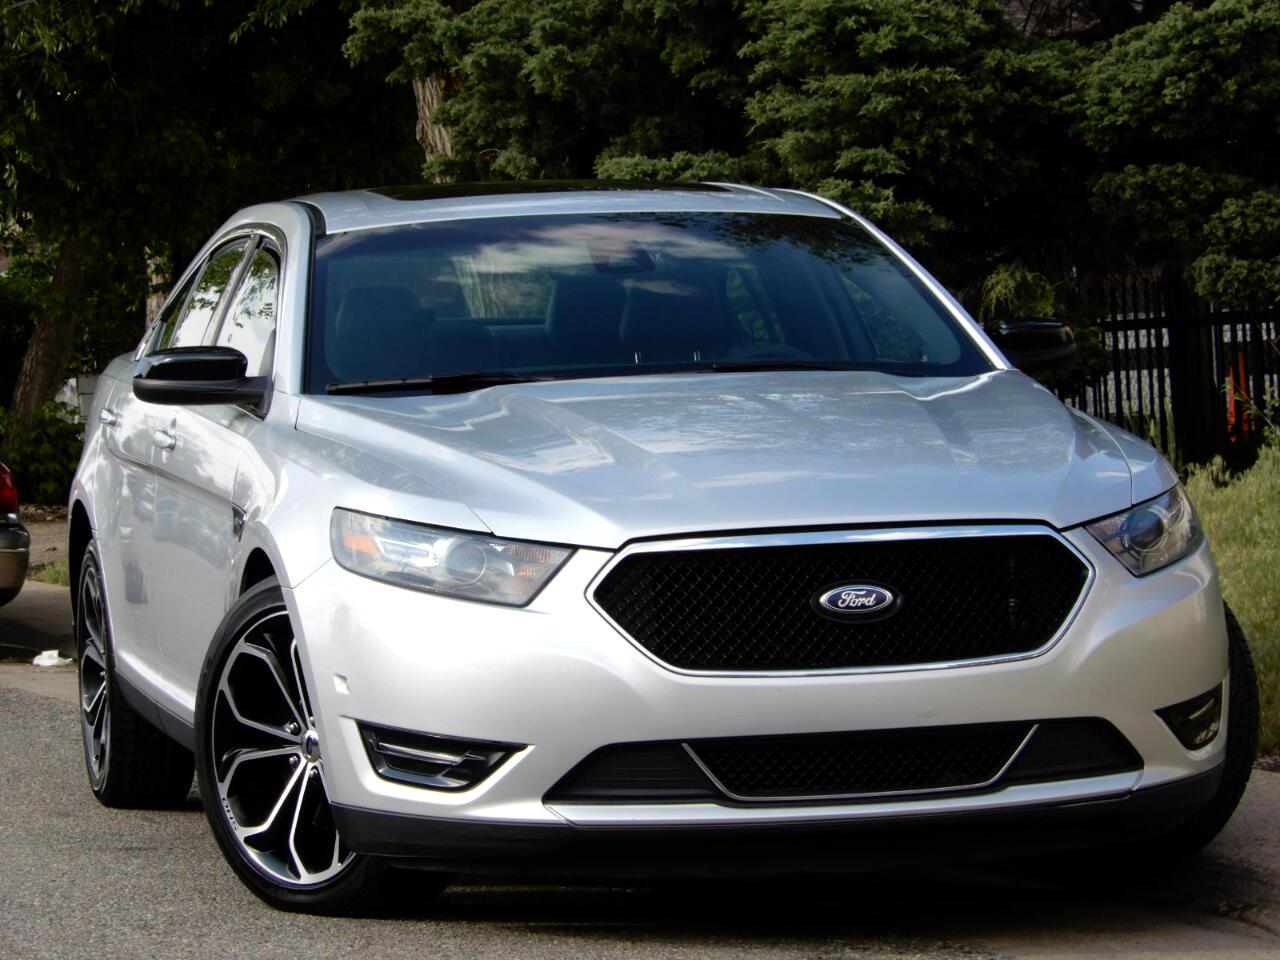 Ford Taurus SHO AWD 2013